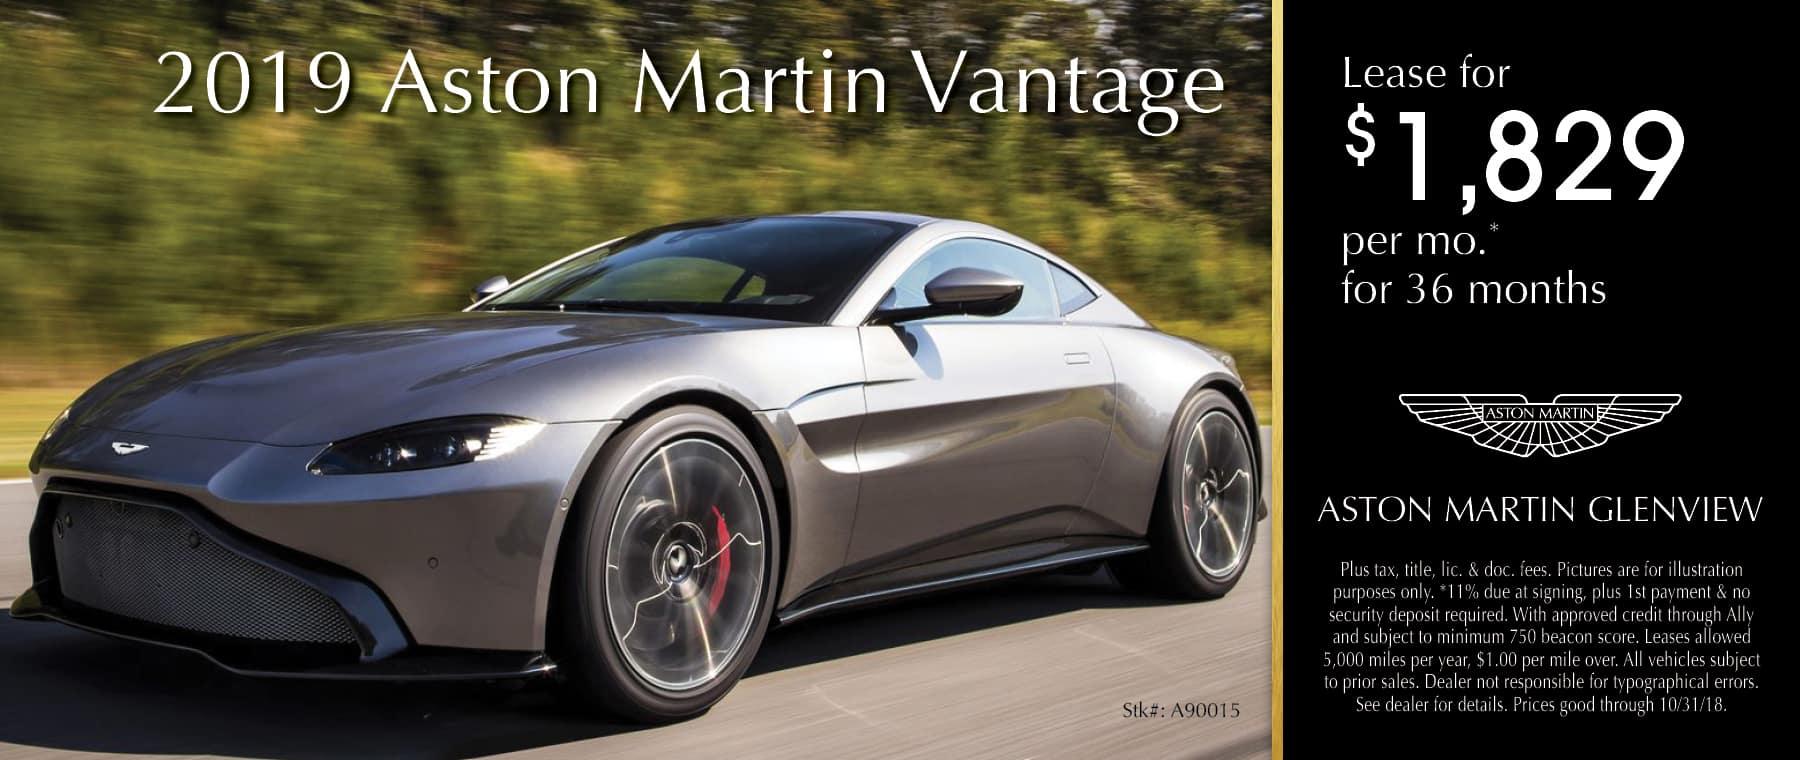 2019 Aston Martin Vantage stk#A90015